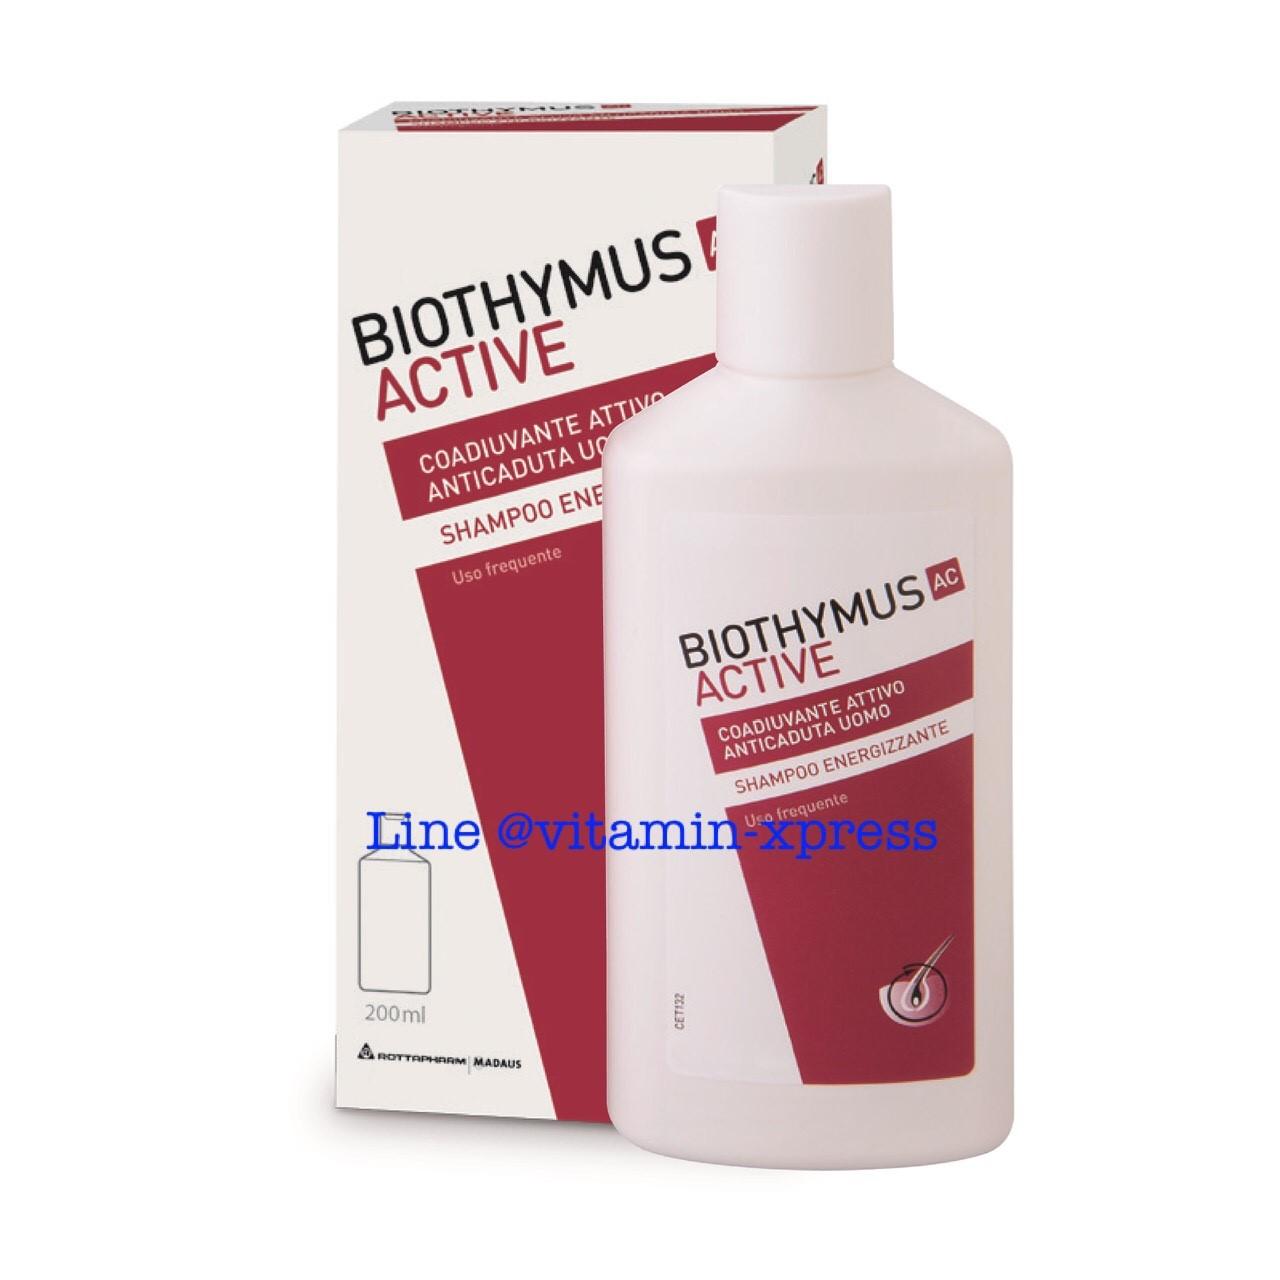 Biothymus active shampoo 200ml สำหรับผู้ชาย